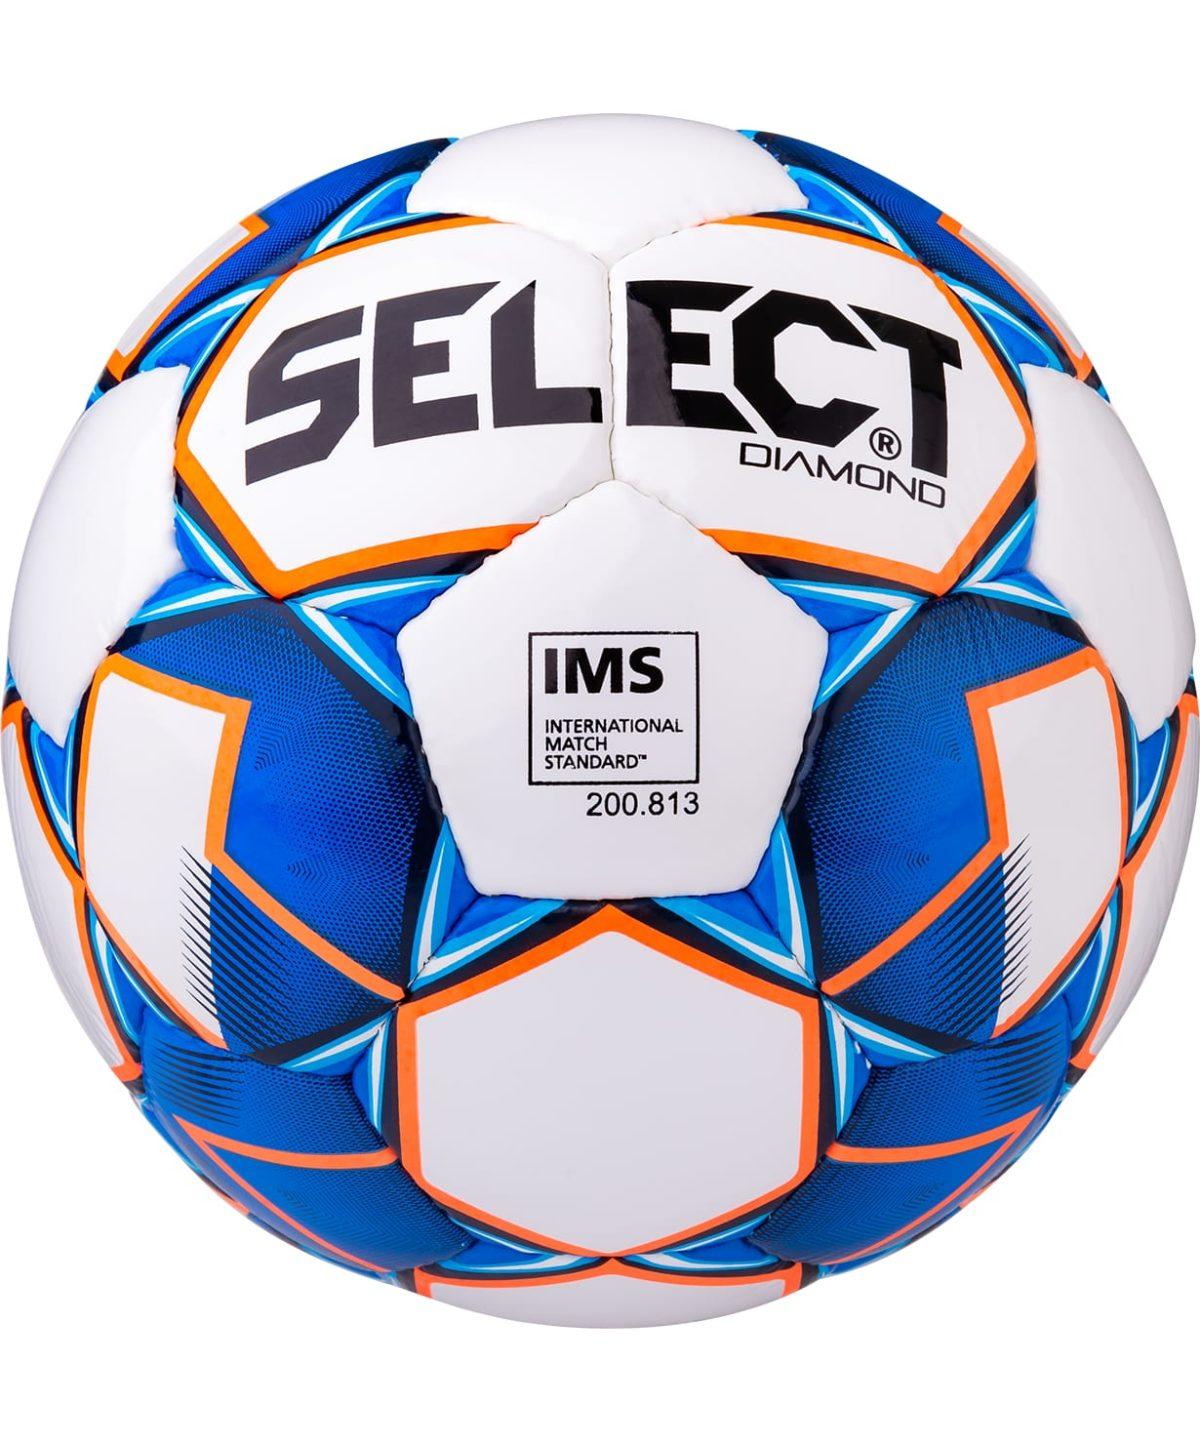 SELECT Diamond IMS Мяч футбольный  810015 №5 - 2